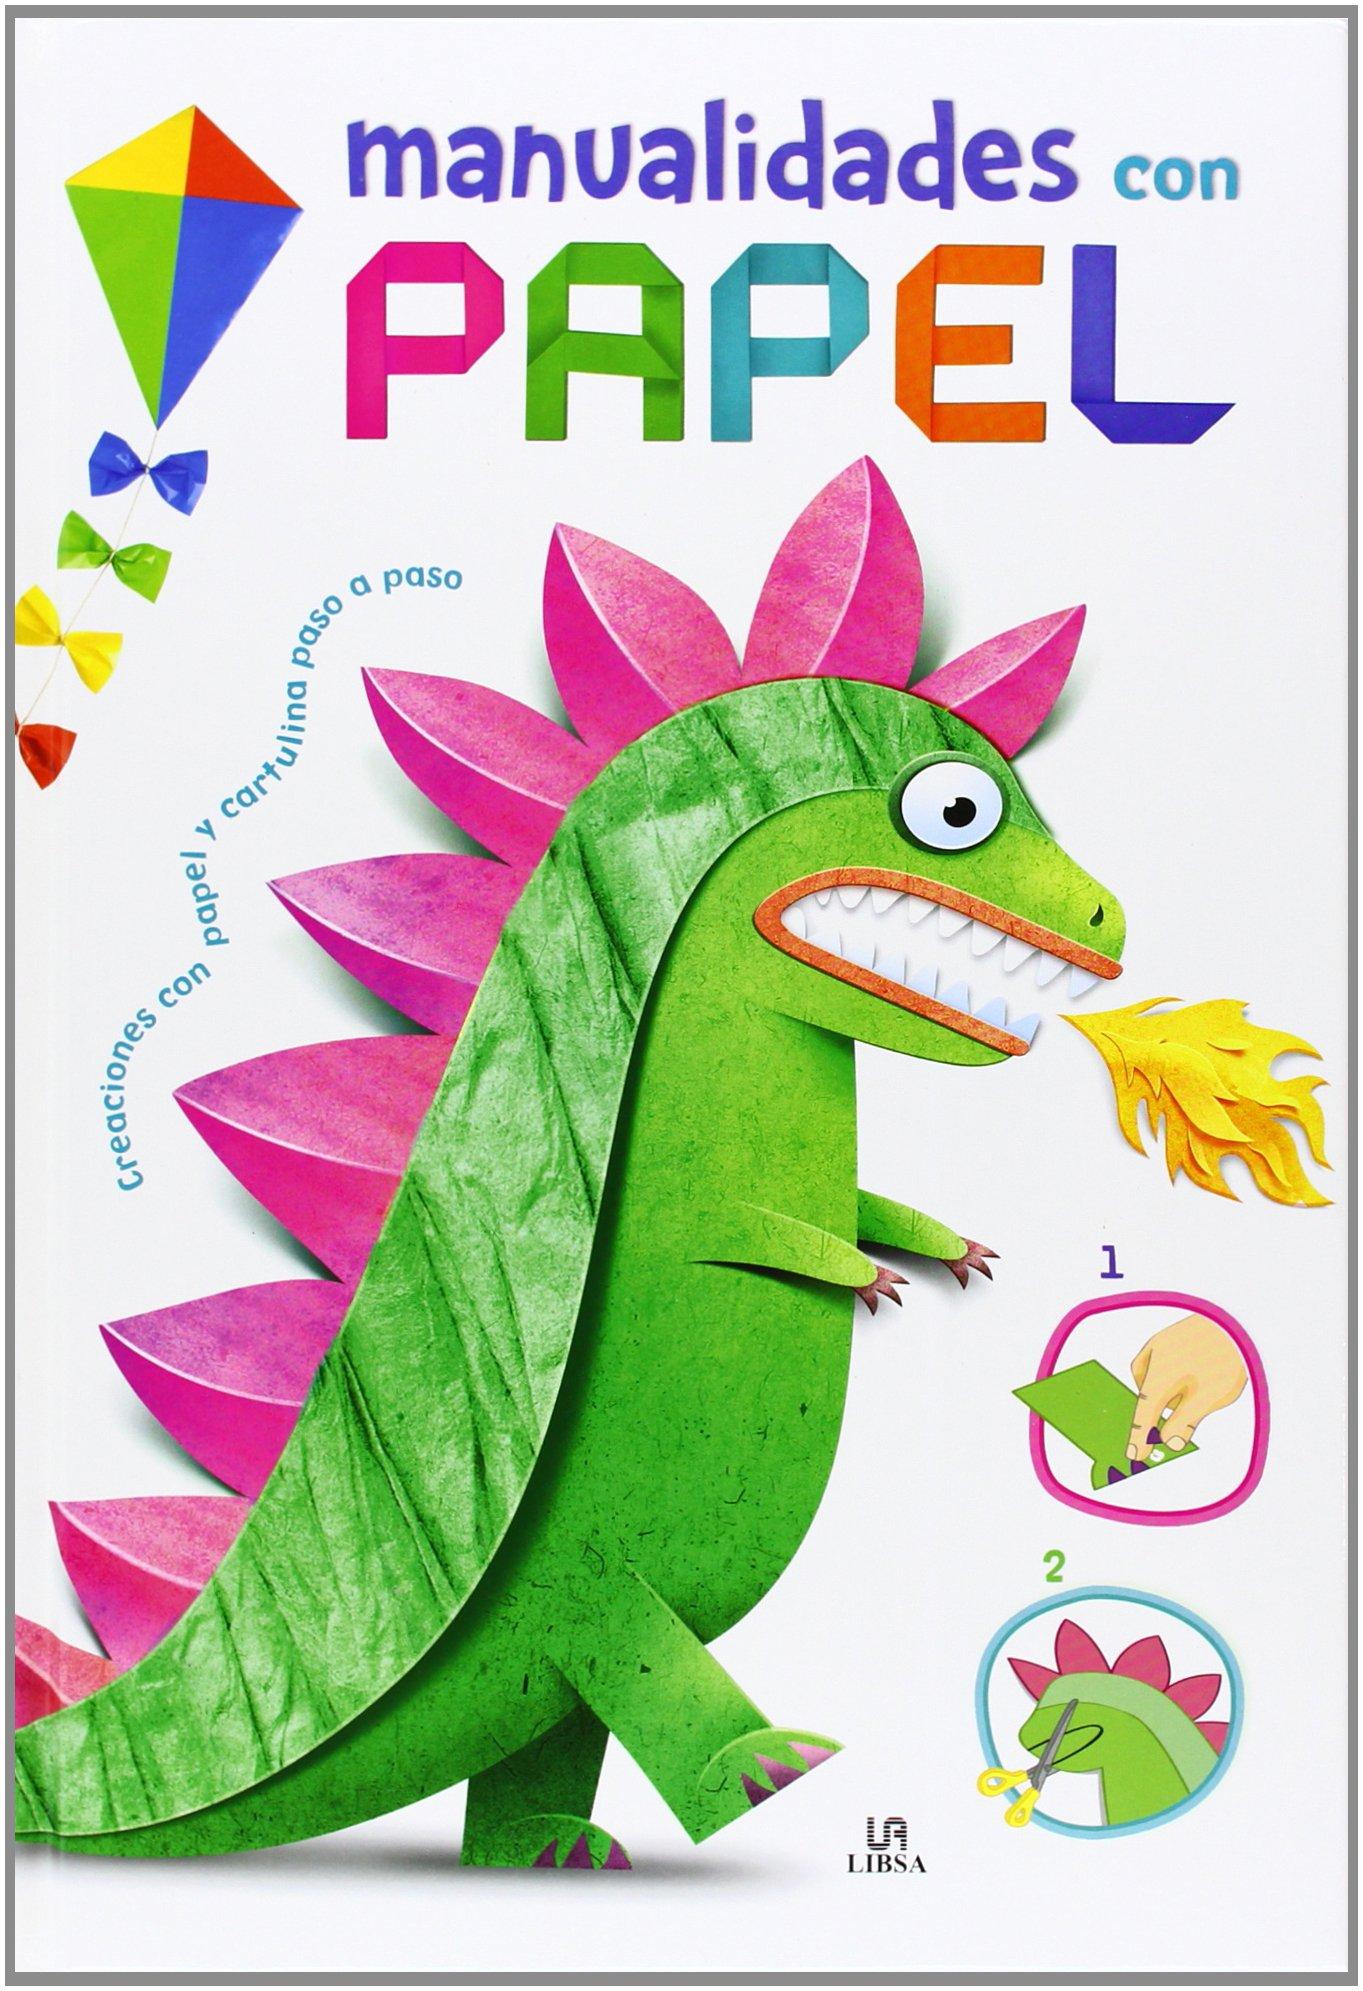 manualidades con papel manualidades para niños amazon es aa vv